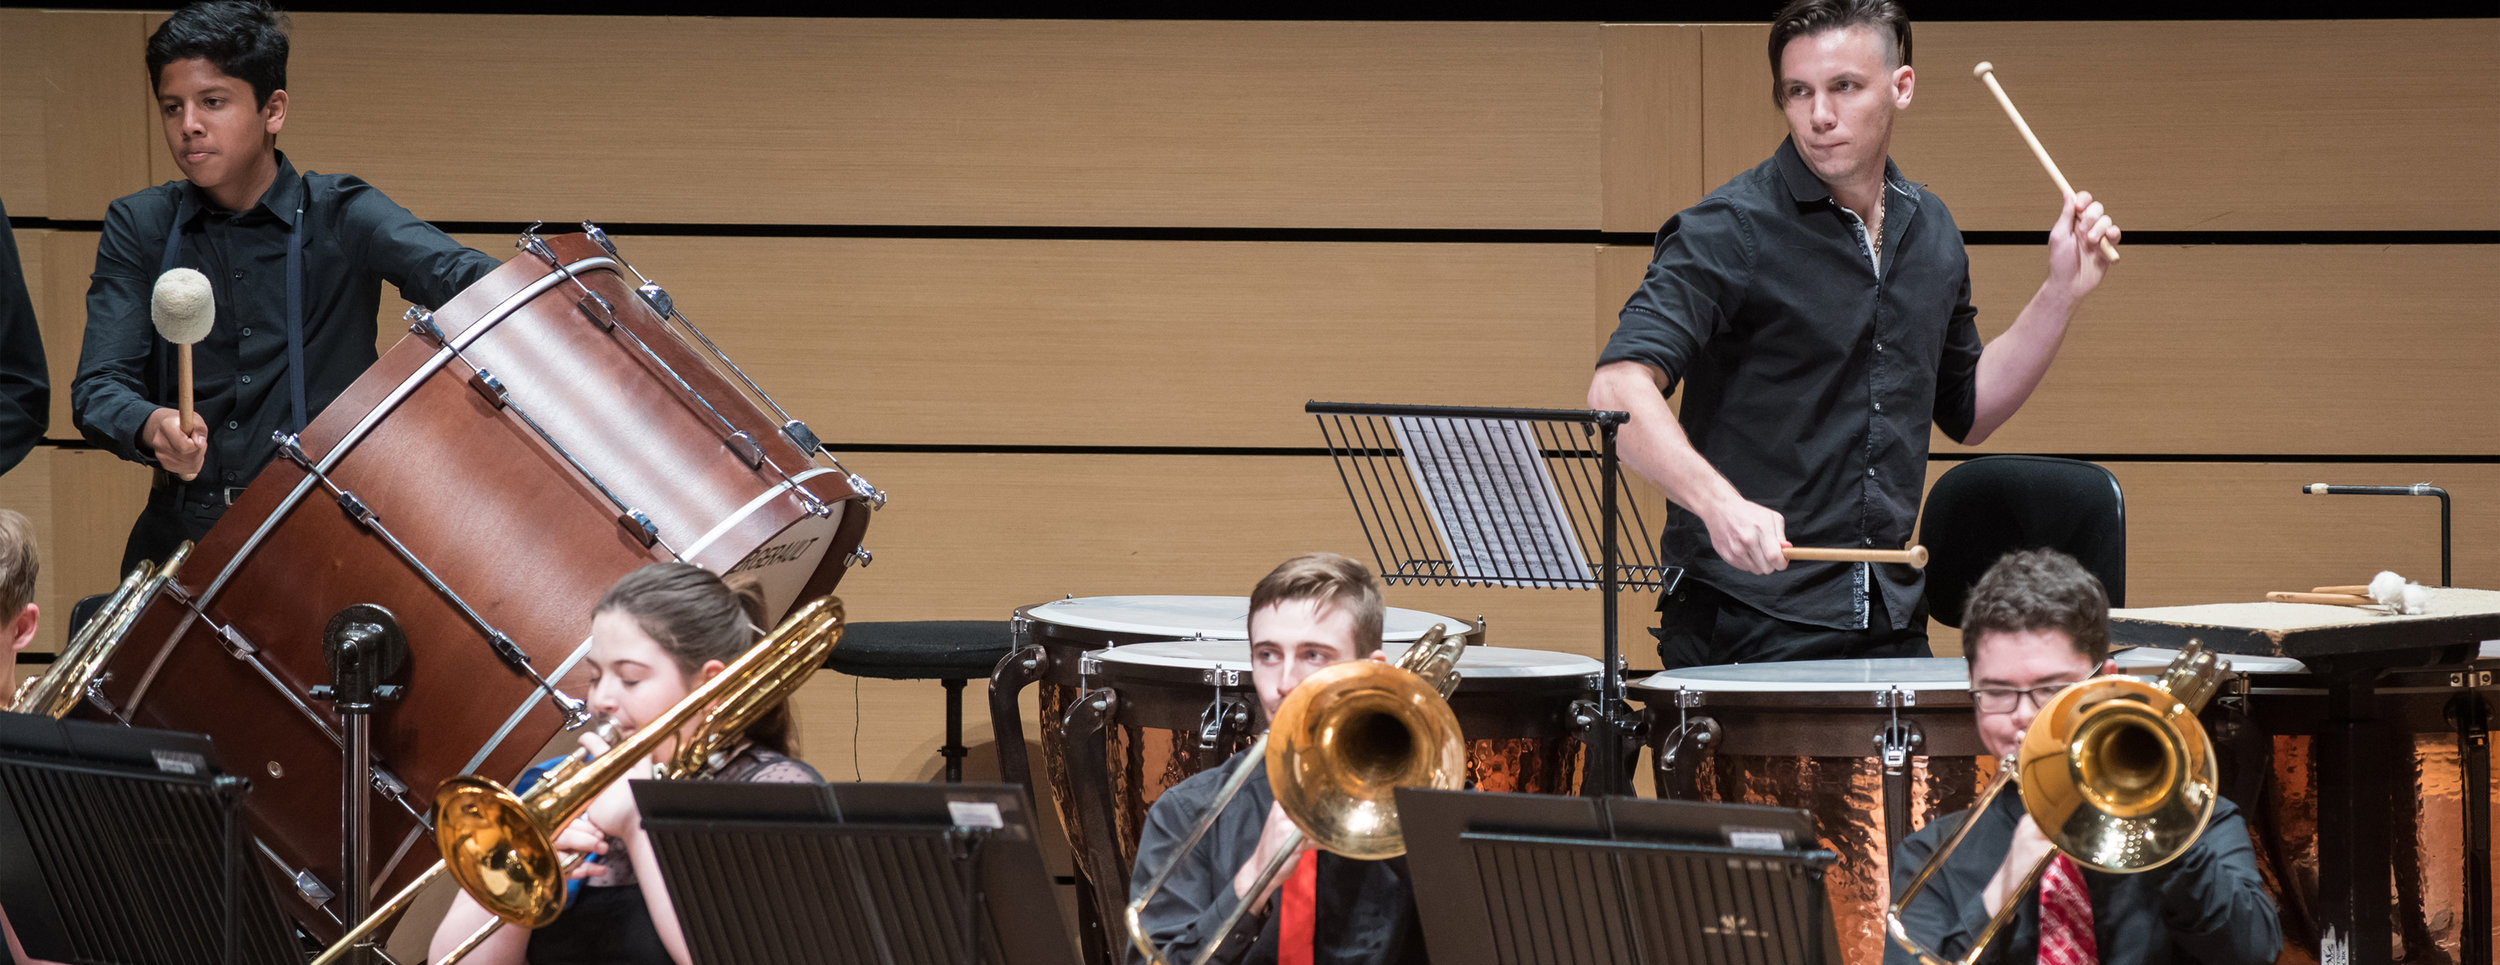 Concert at Twilight - Wind Symphony& UQ Chorale